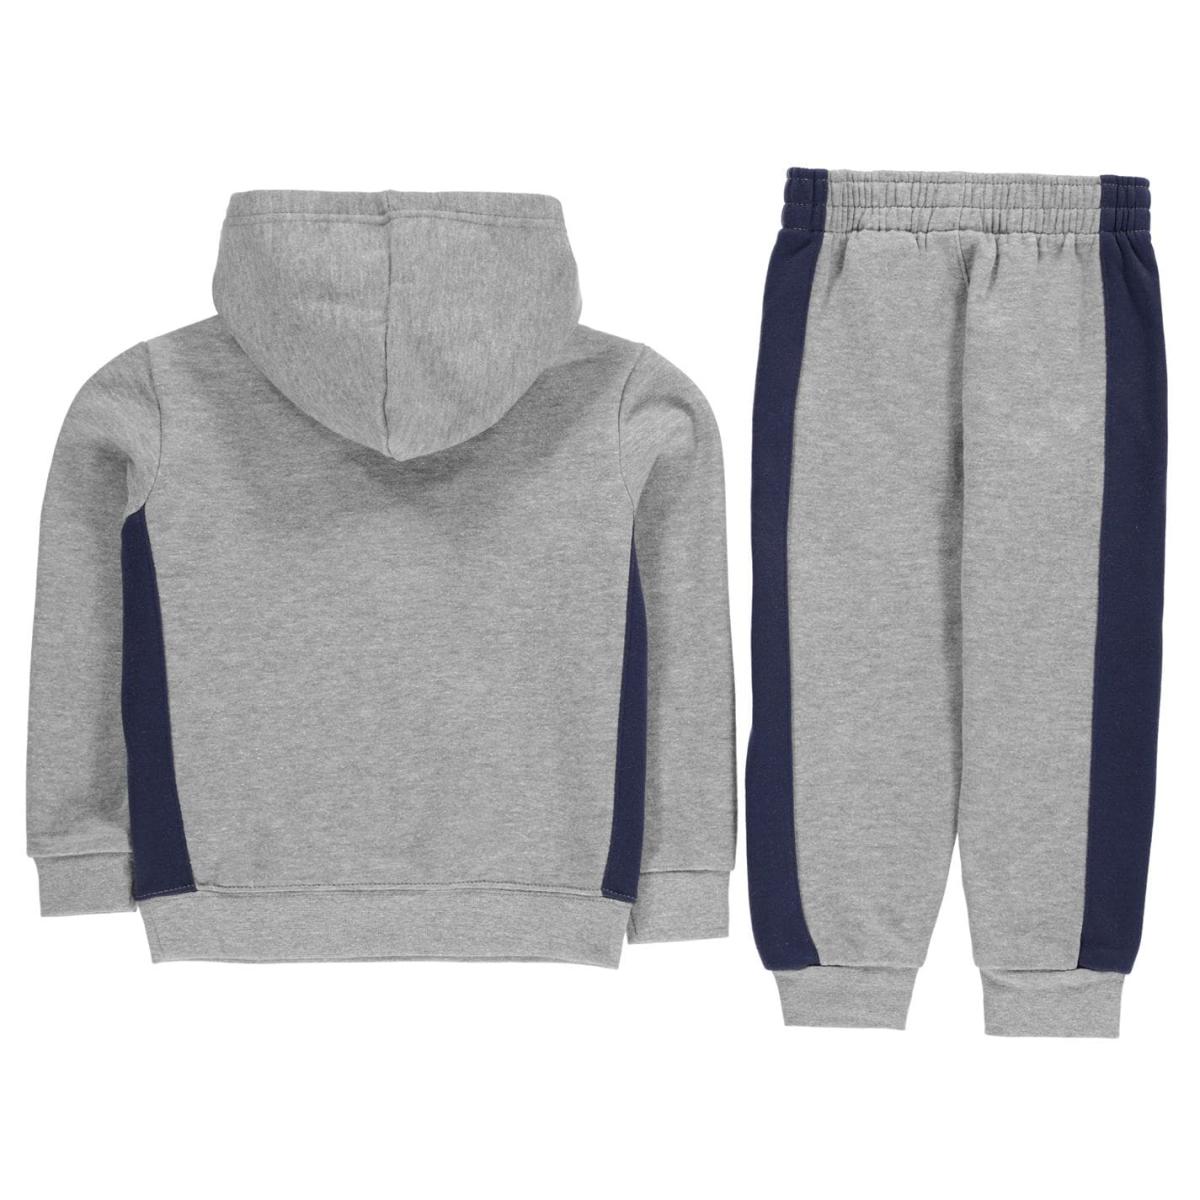 Nike Trainingsanzug Sportanzug Kinder Jungen Fleece 8099